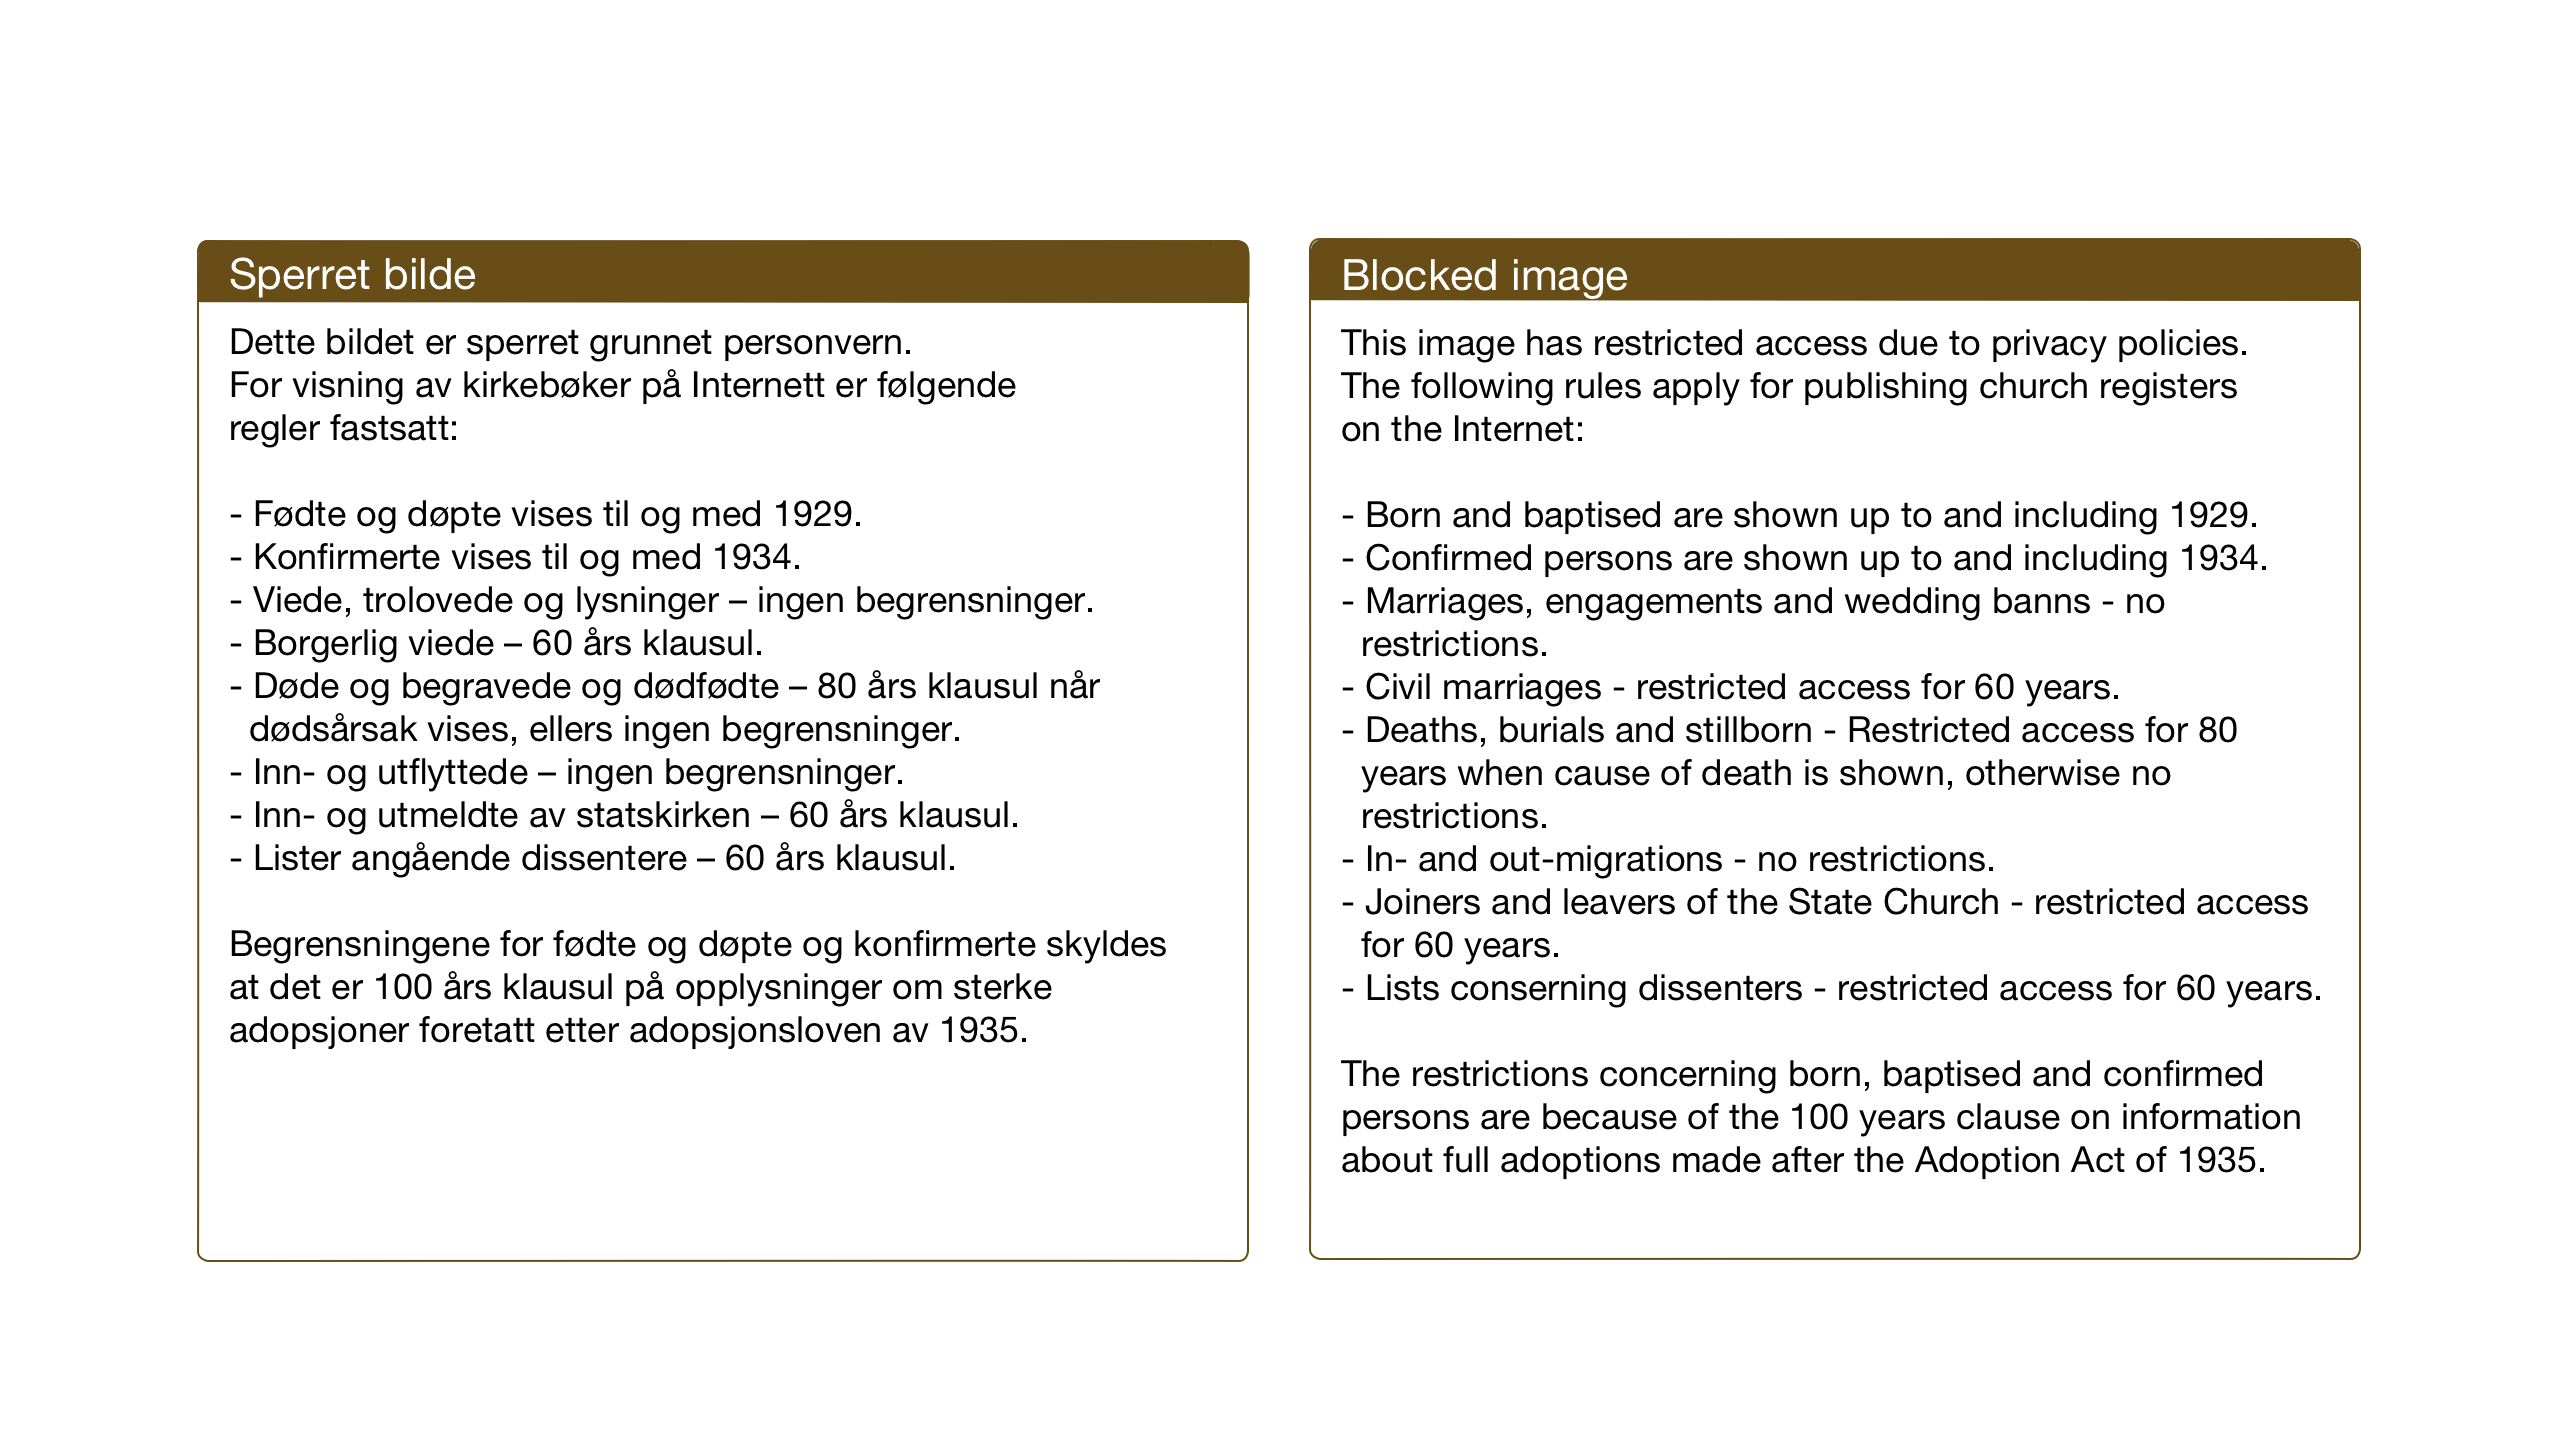 SAT, Ministerialprotokoller, klokkerbøker og fødselsregistre - Nordland, 847/L0680: Klokkerbok nr. 847C08, 1930-1947, s. 200